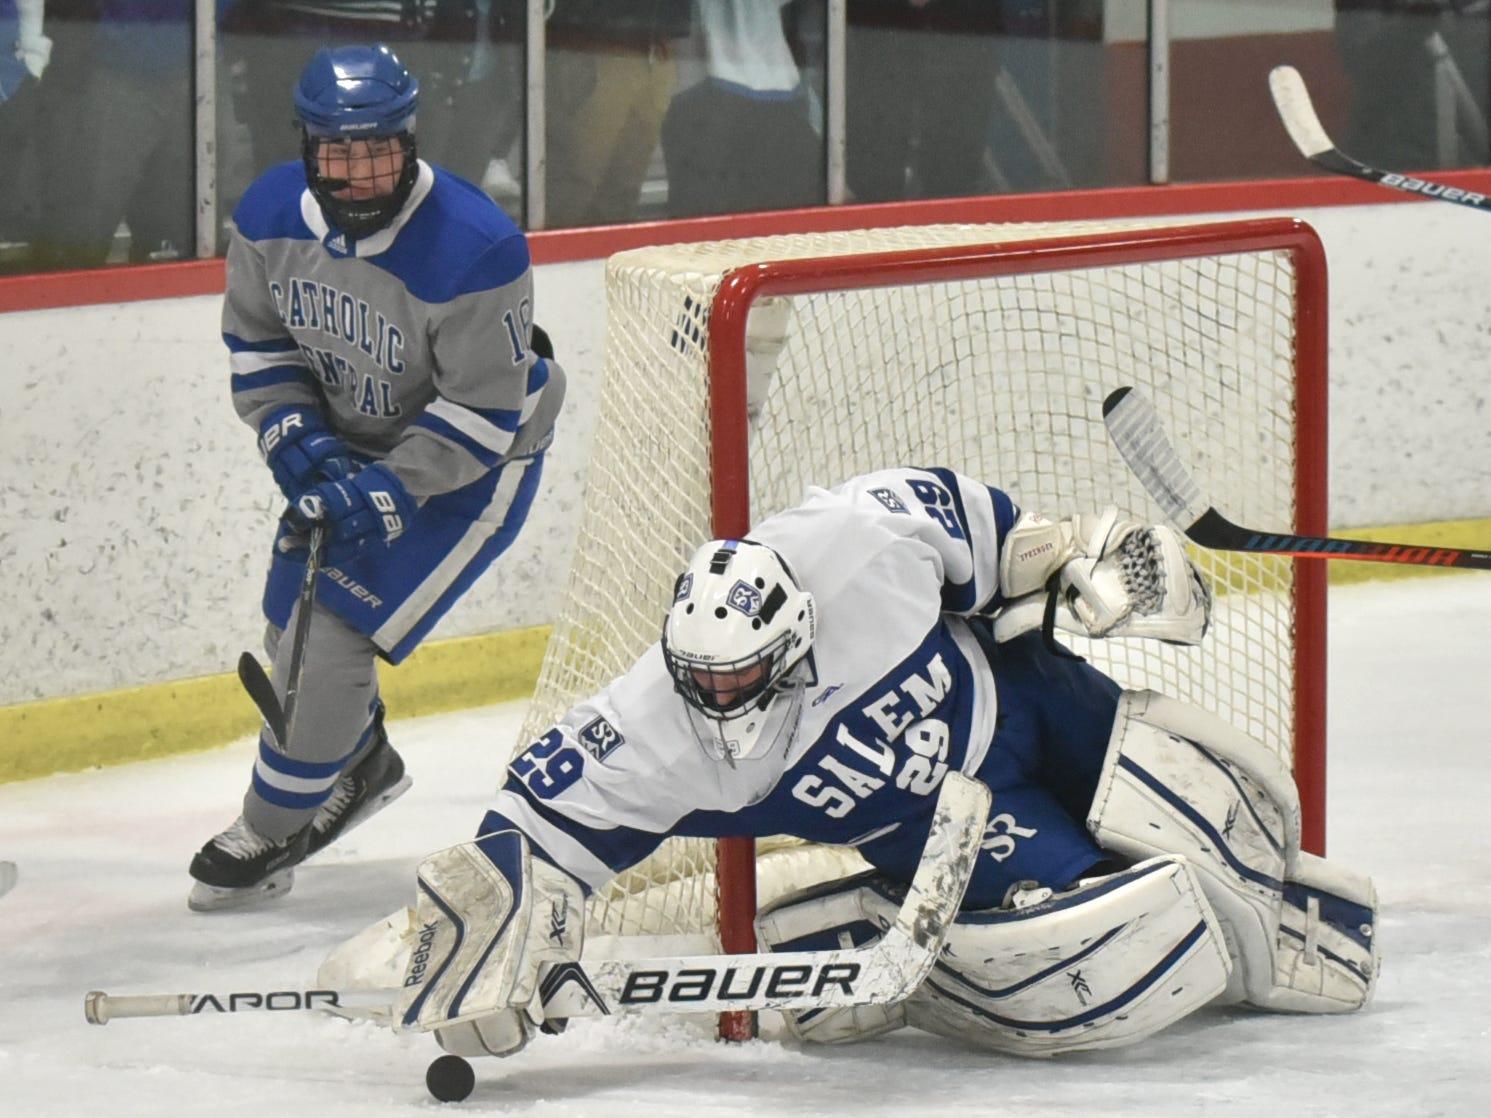 With Shamrock Dylan Dooley lurking nearby, Salem  High goalie Austin Goleniak pounces on a puck near his net.